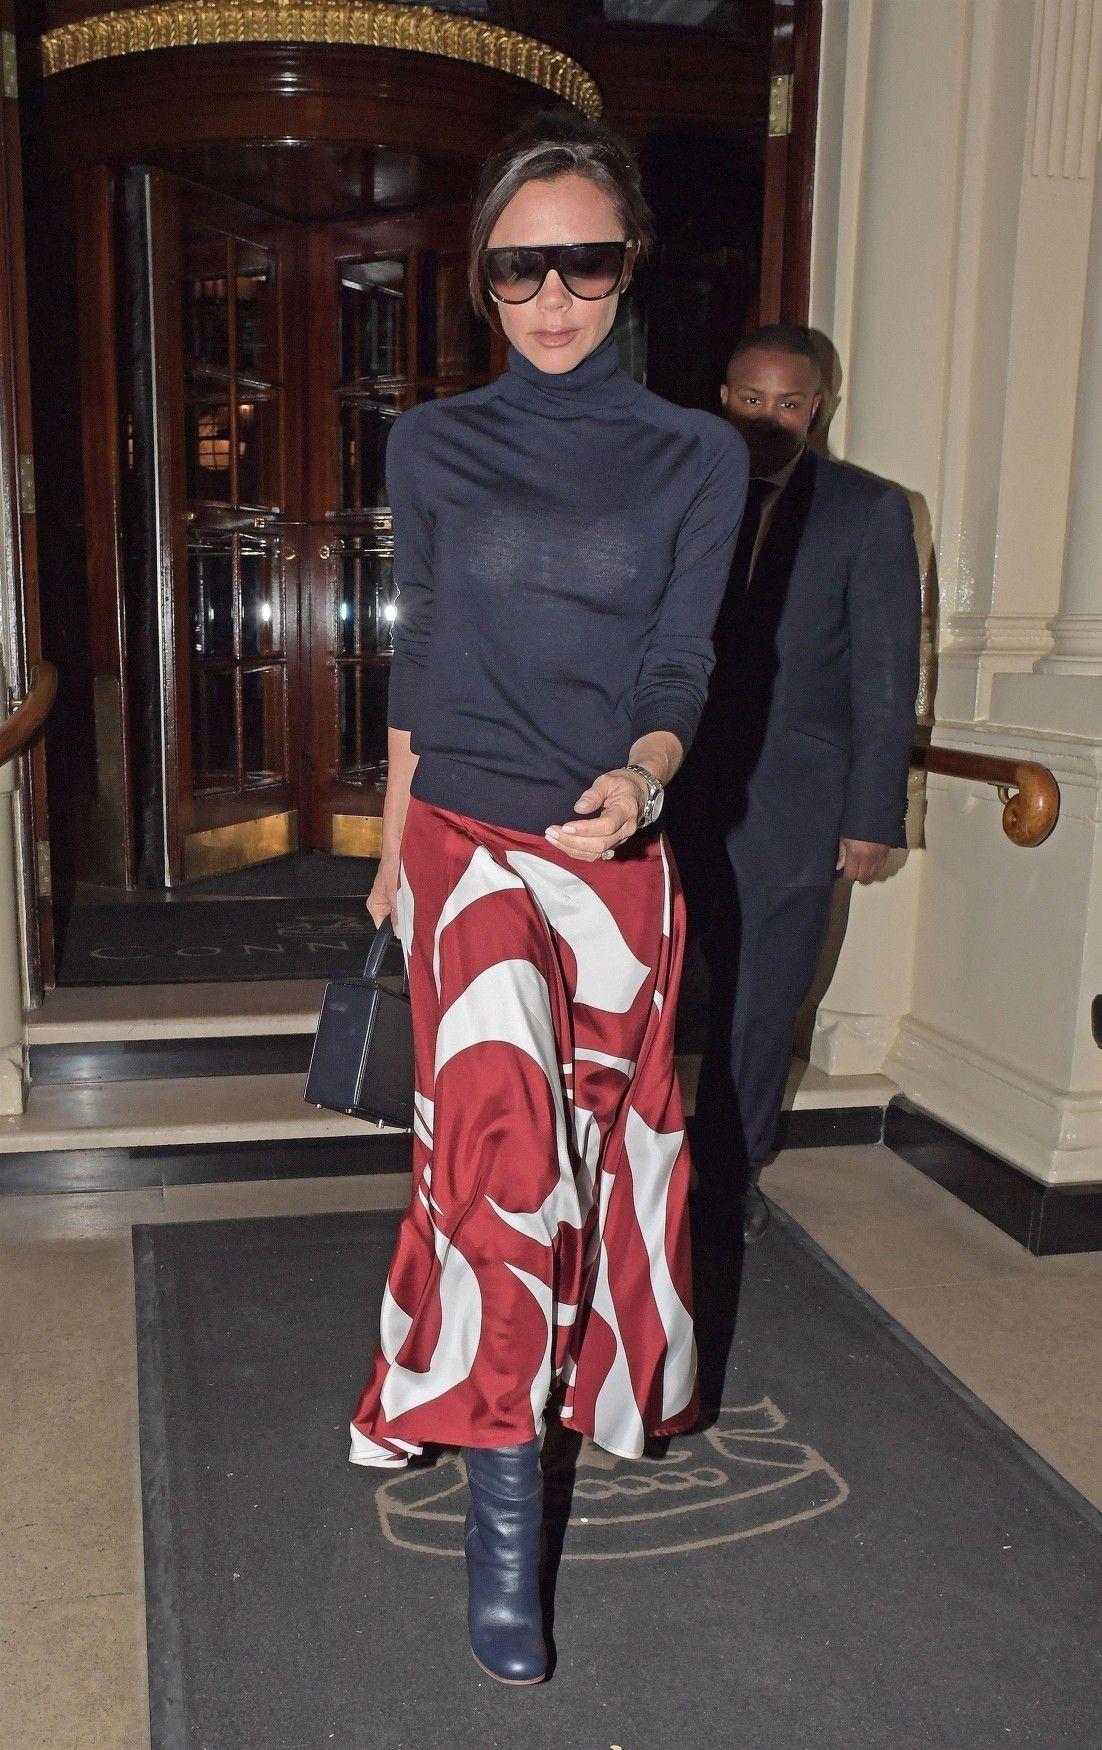 Victoria-Beckham-Wearing-A-See-Thru-Blouse-In-London-3715  Celebrity-Slipscom-9365